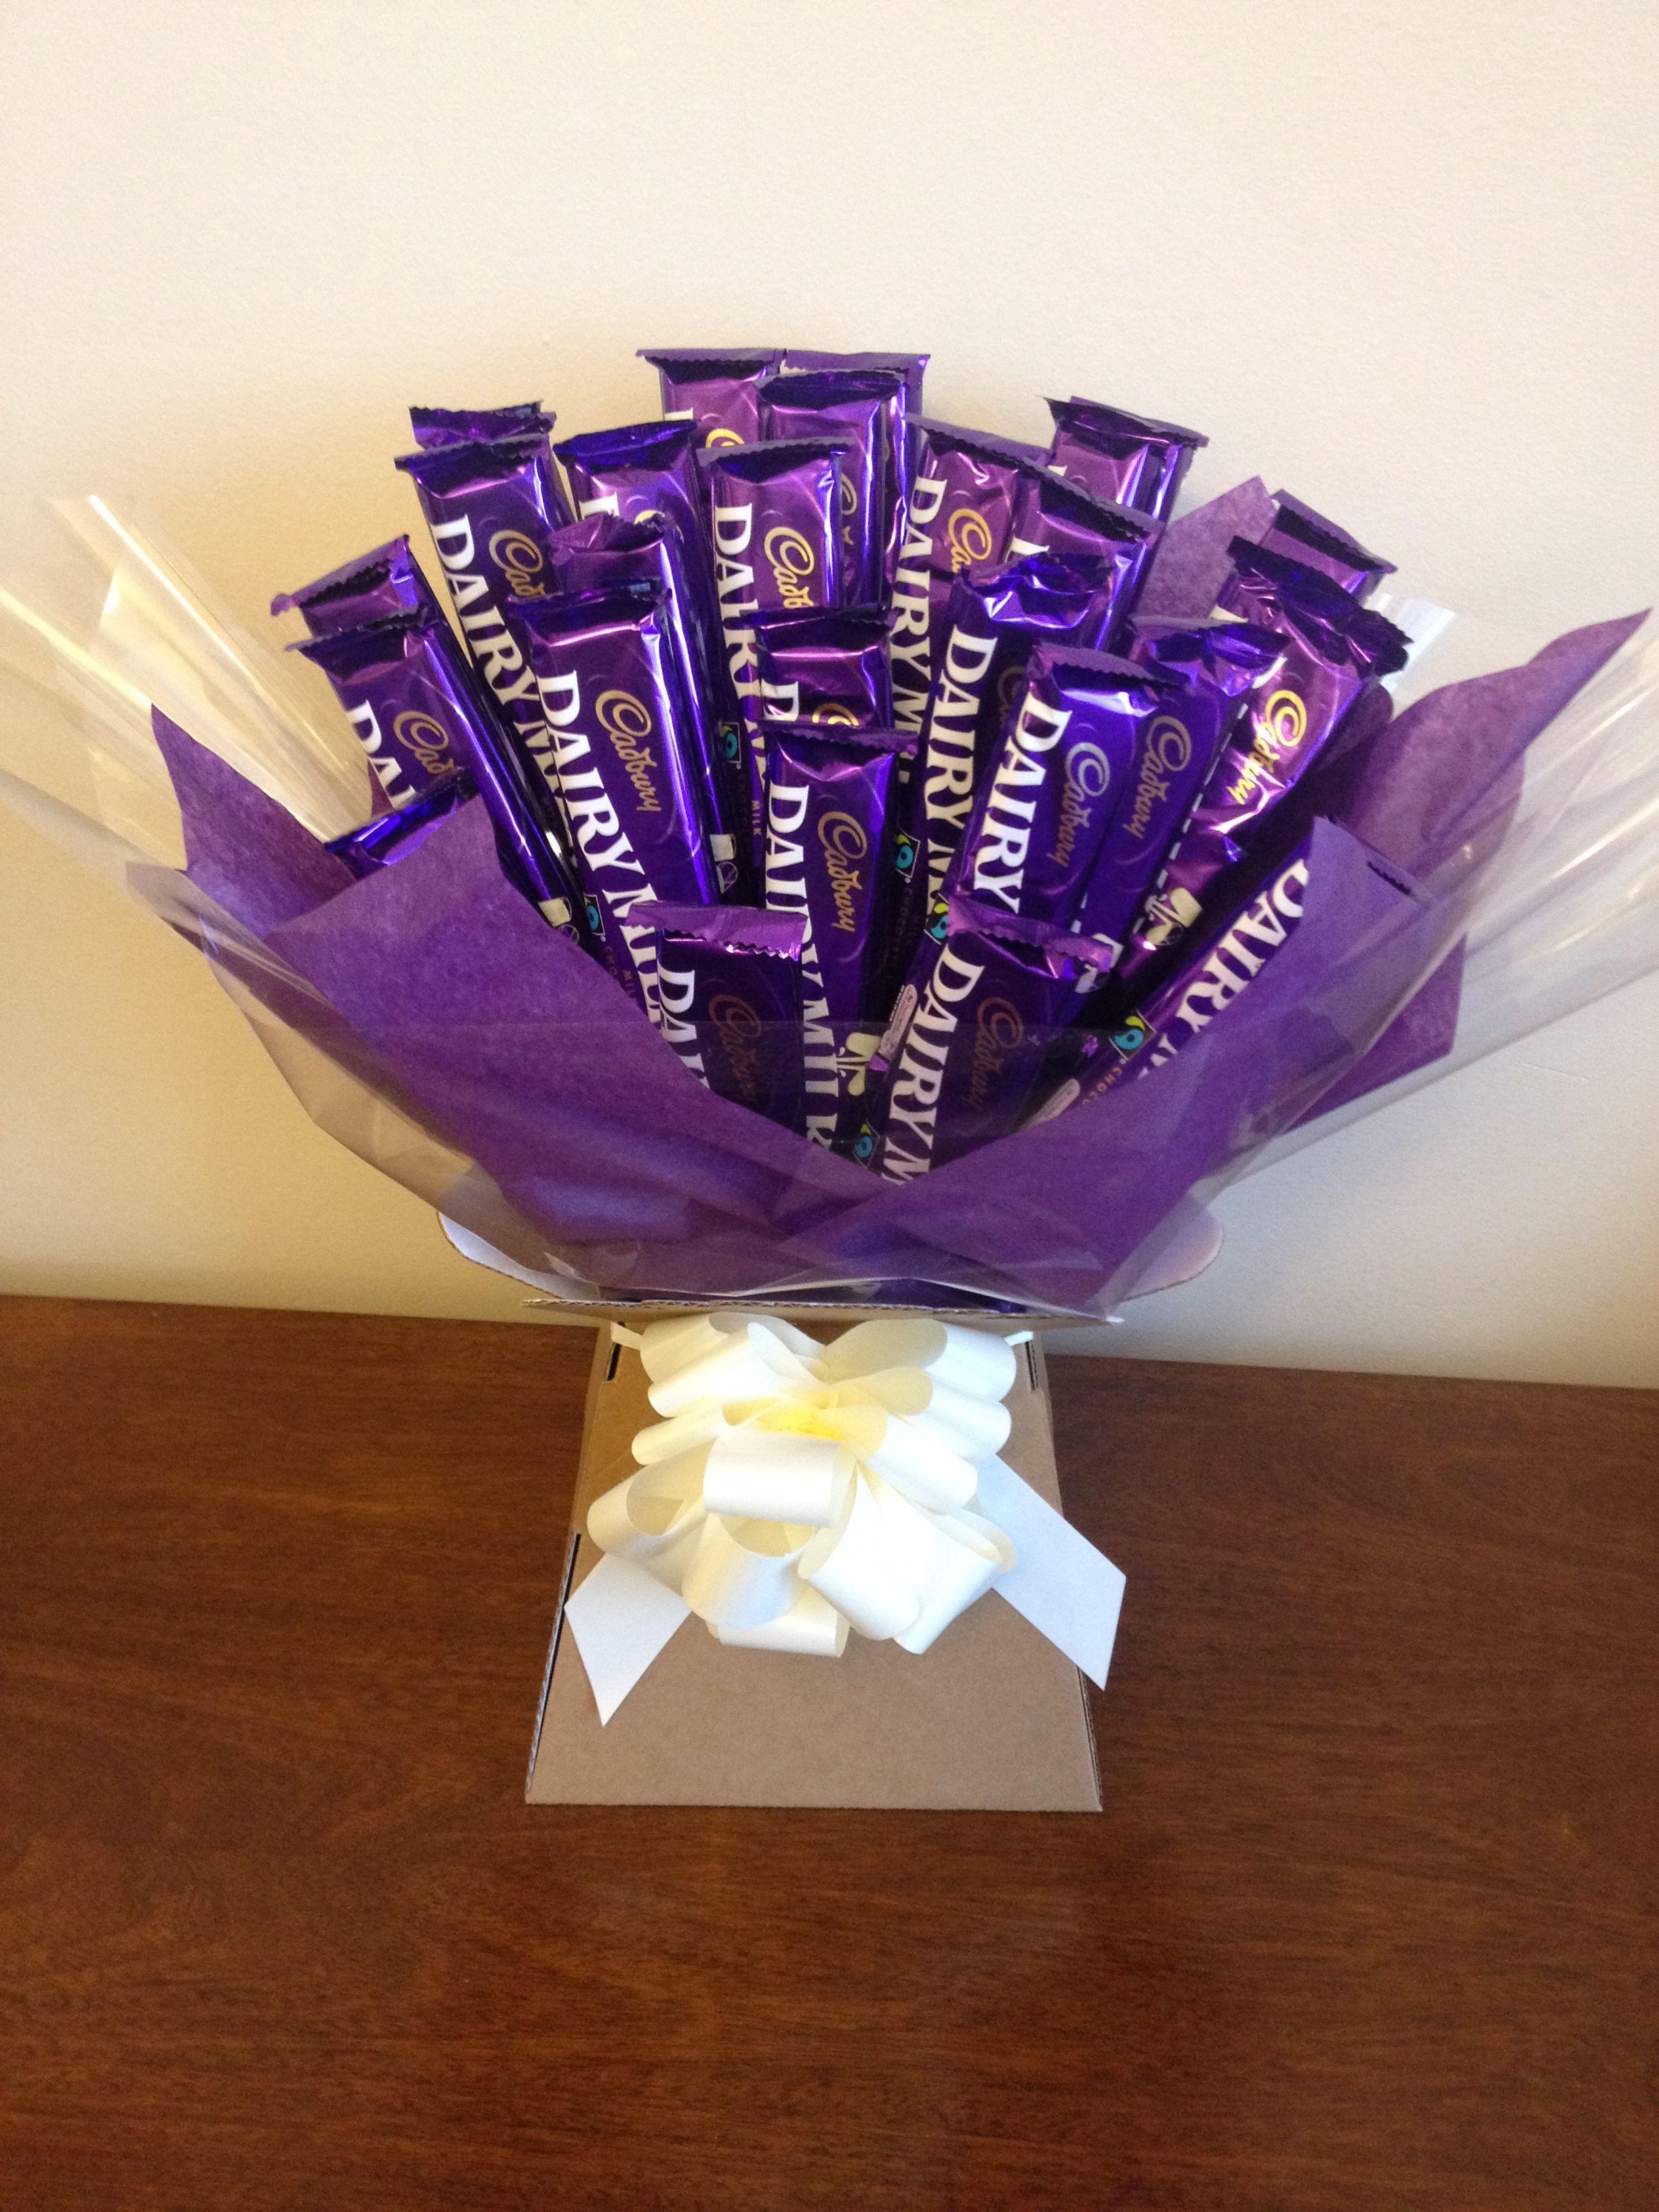 cadburys chocolate dairy milk sweetie bouquetwho wants